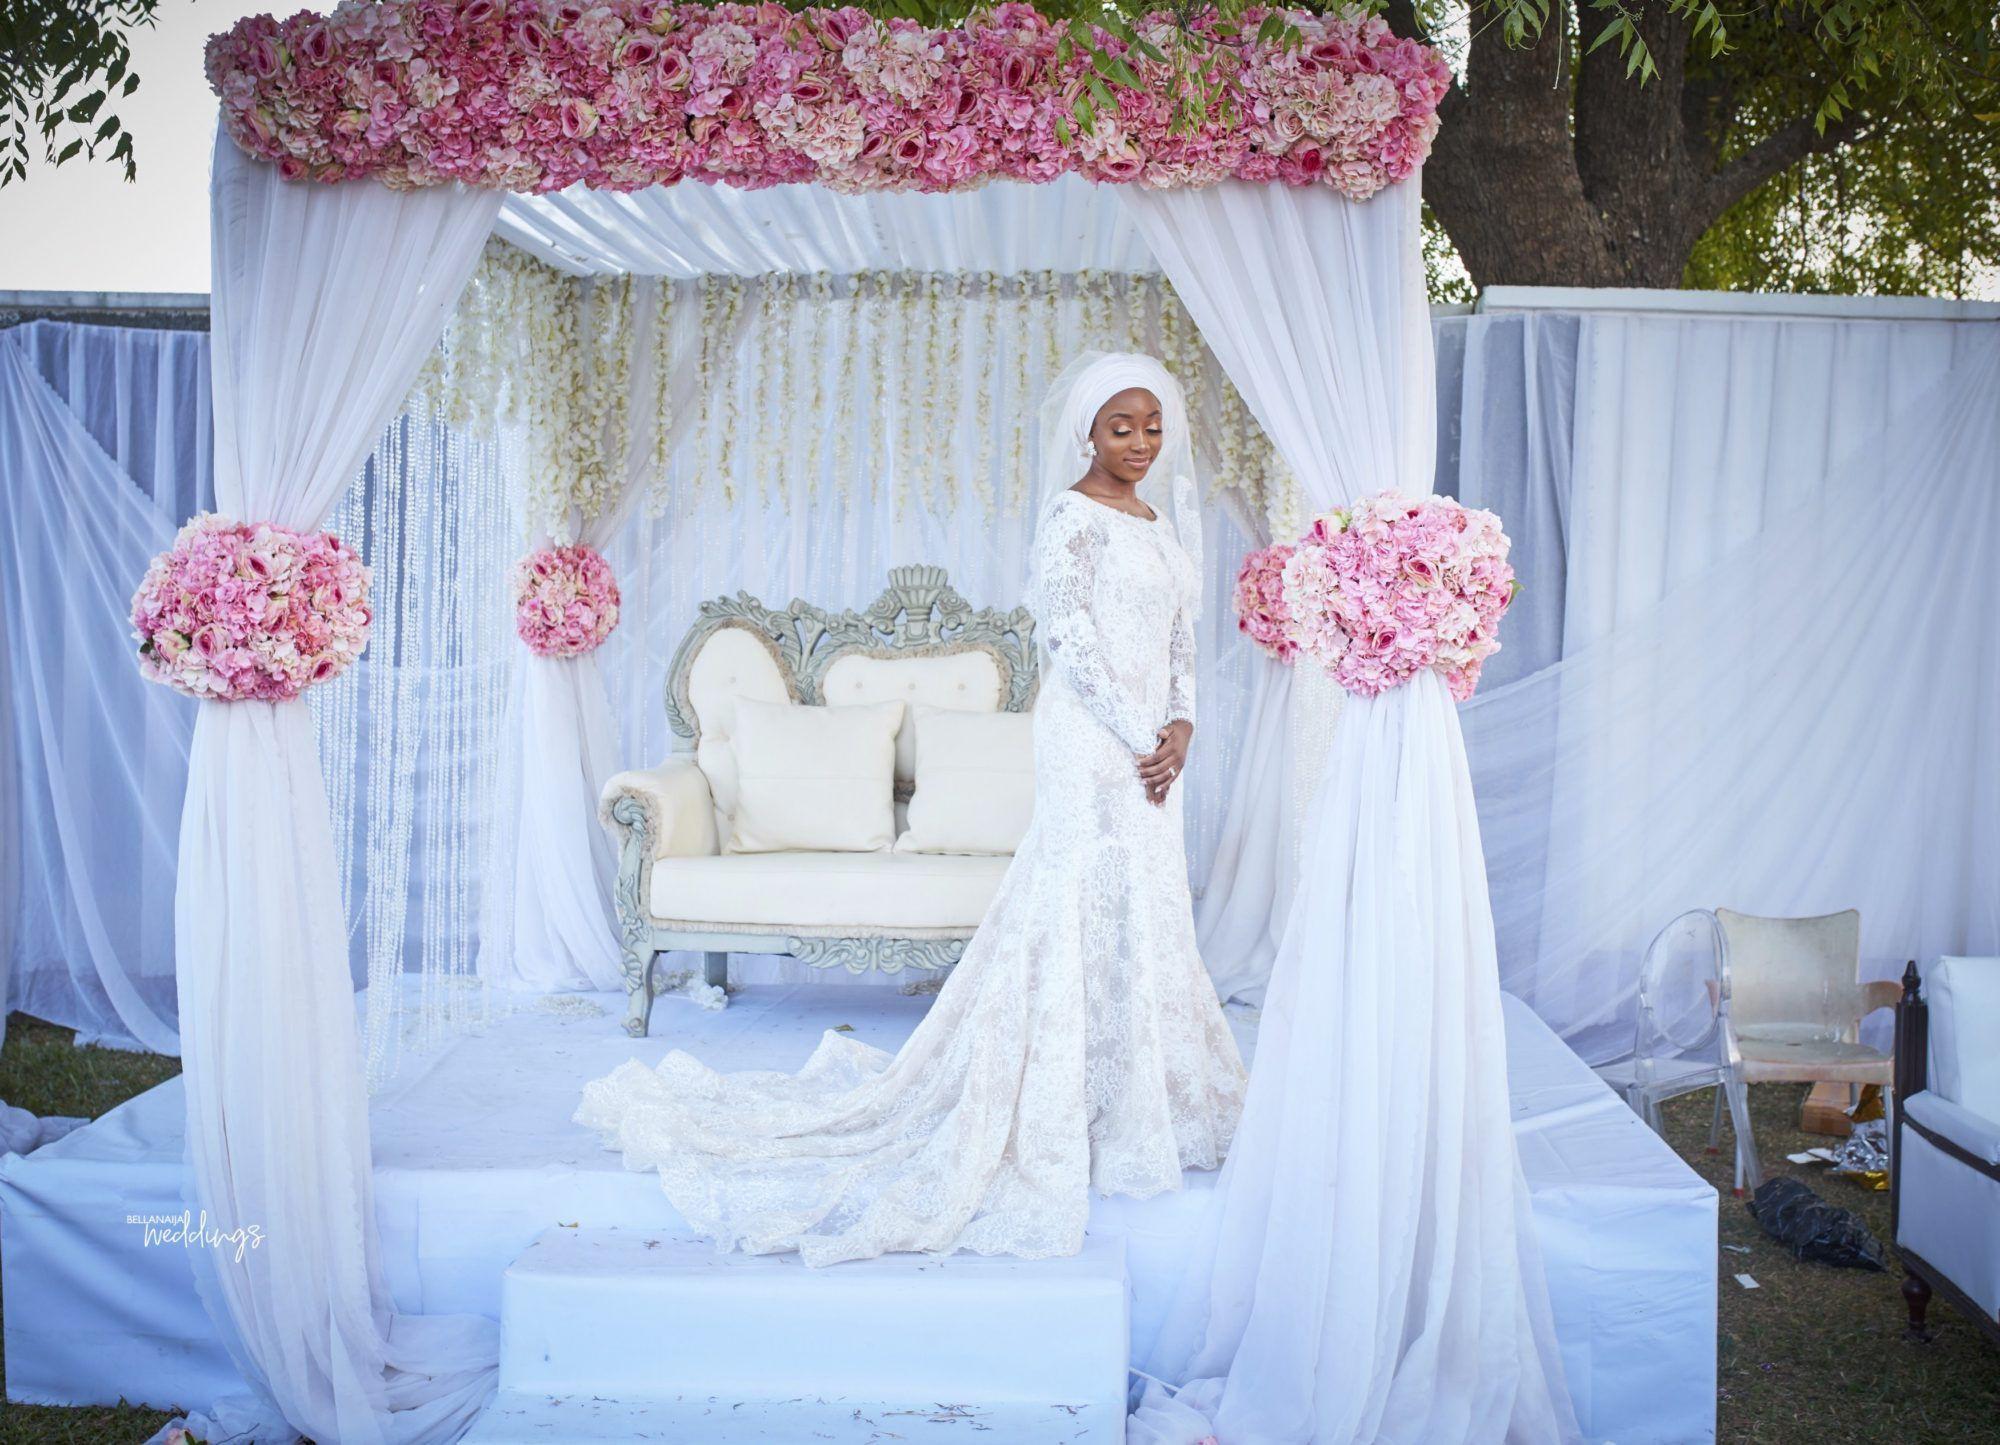 Nigerian Dresses For Nigerian Brides, Interior Design Services, The Vow Exchange